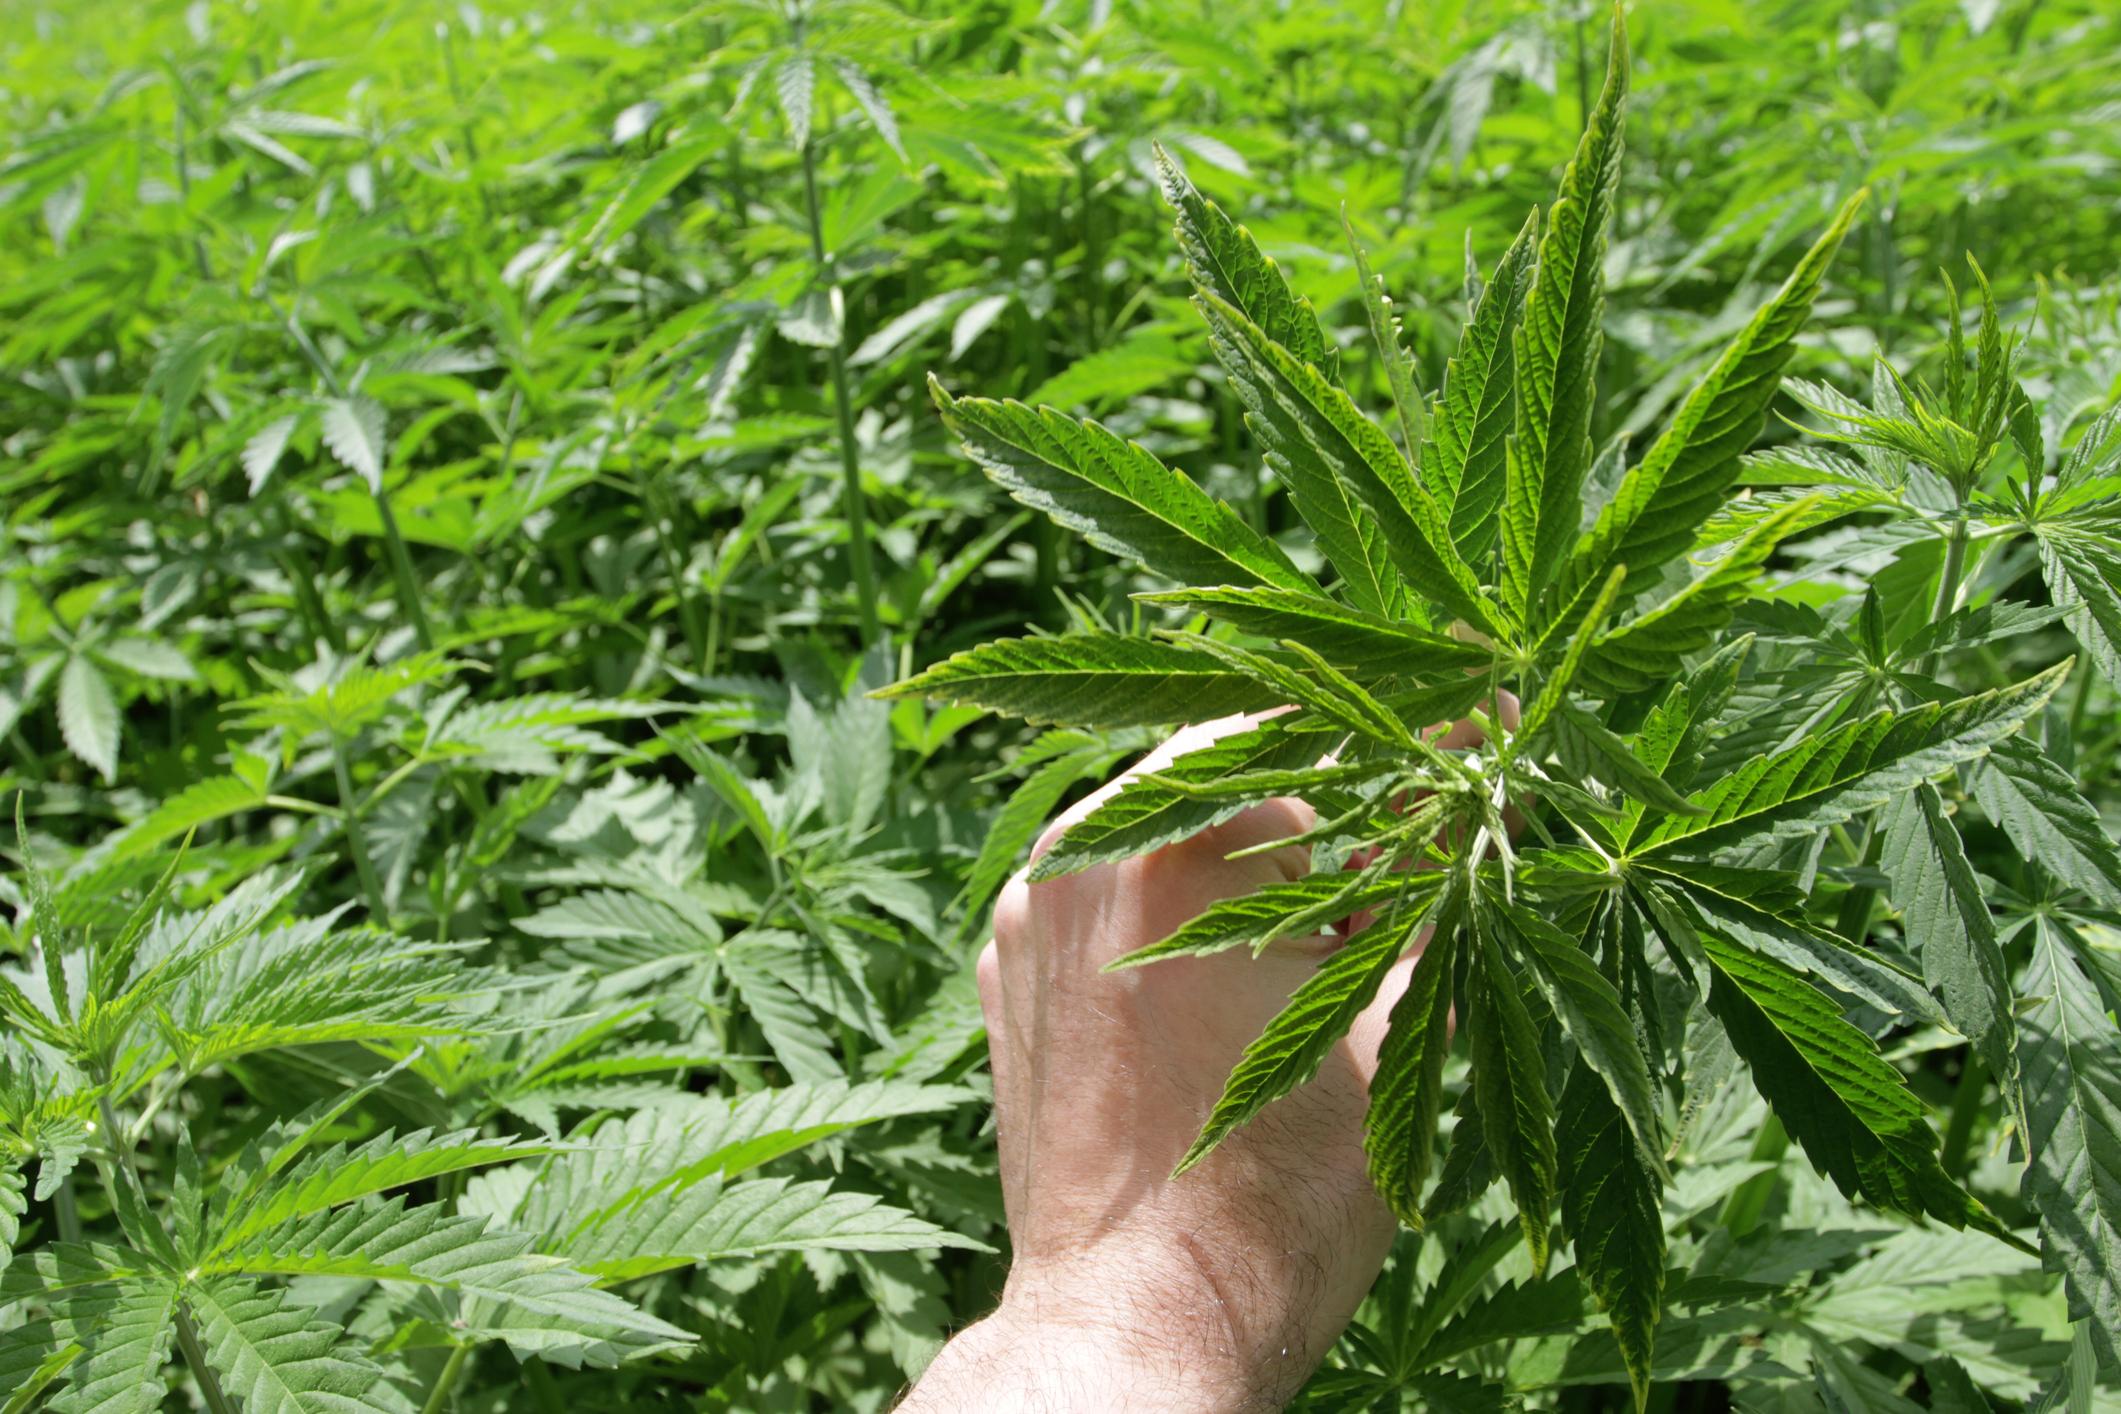 A person holding a cannabis plant in an outdoor grow farm.